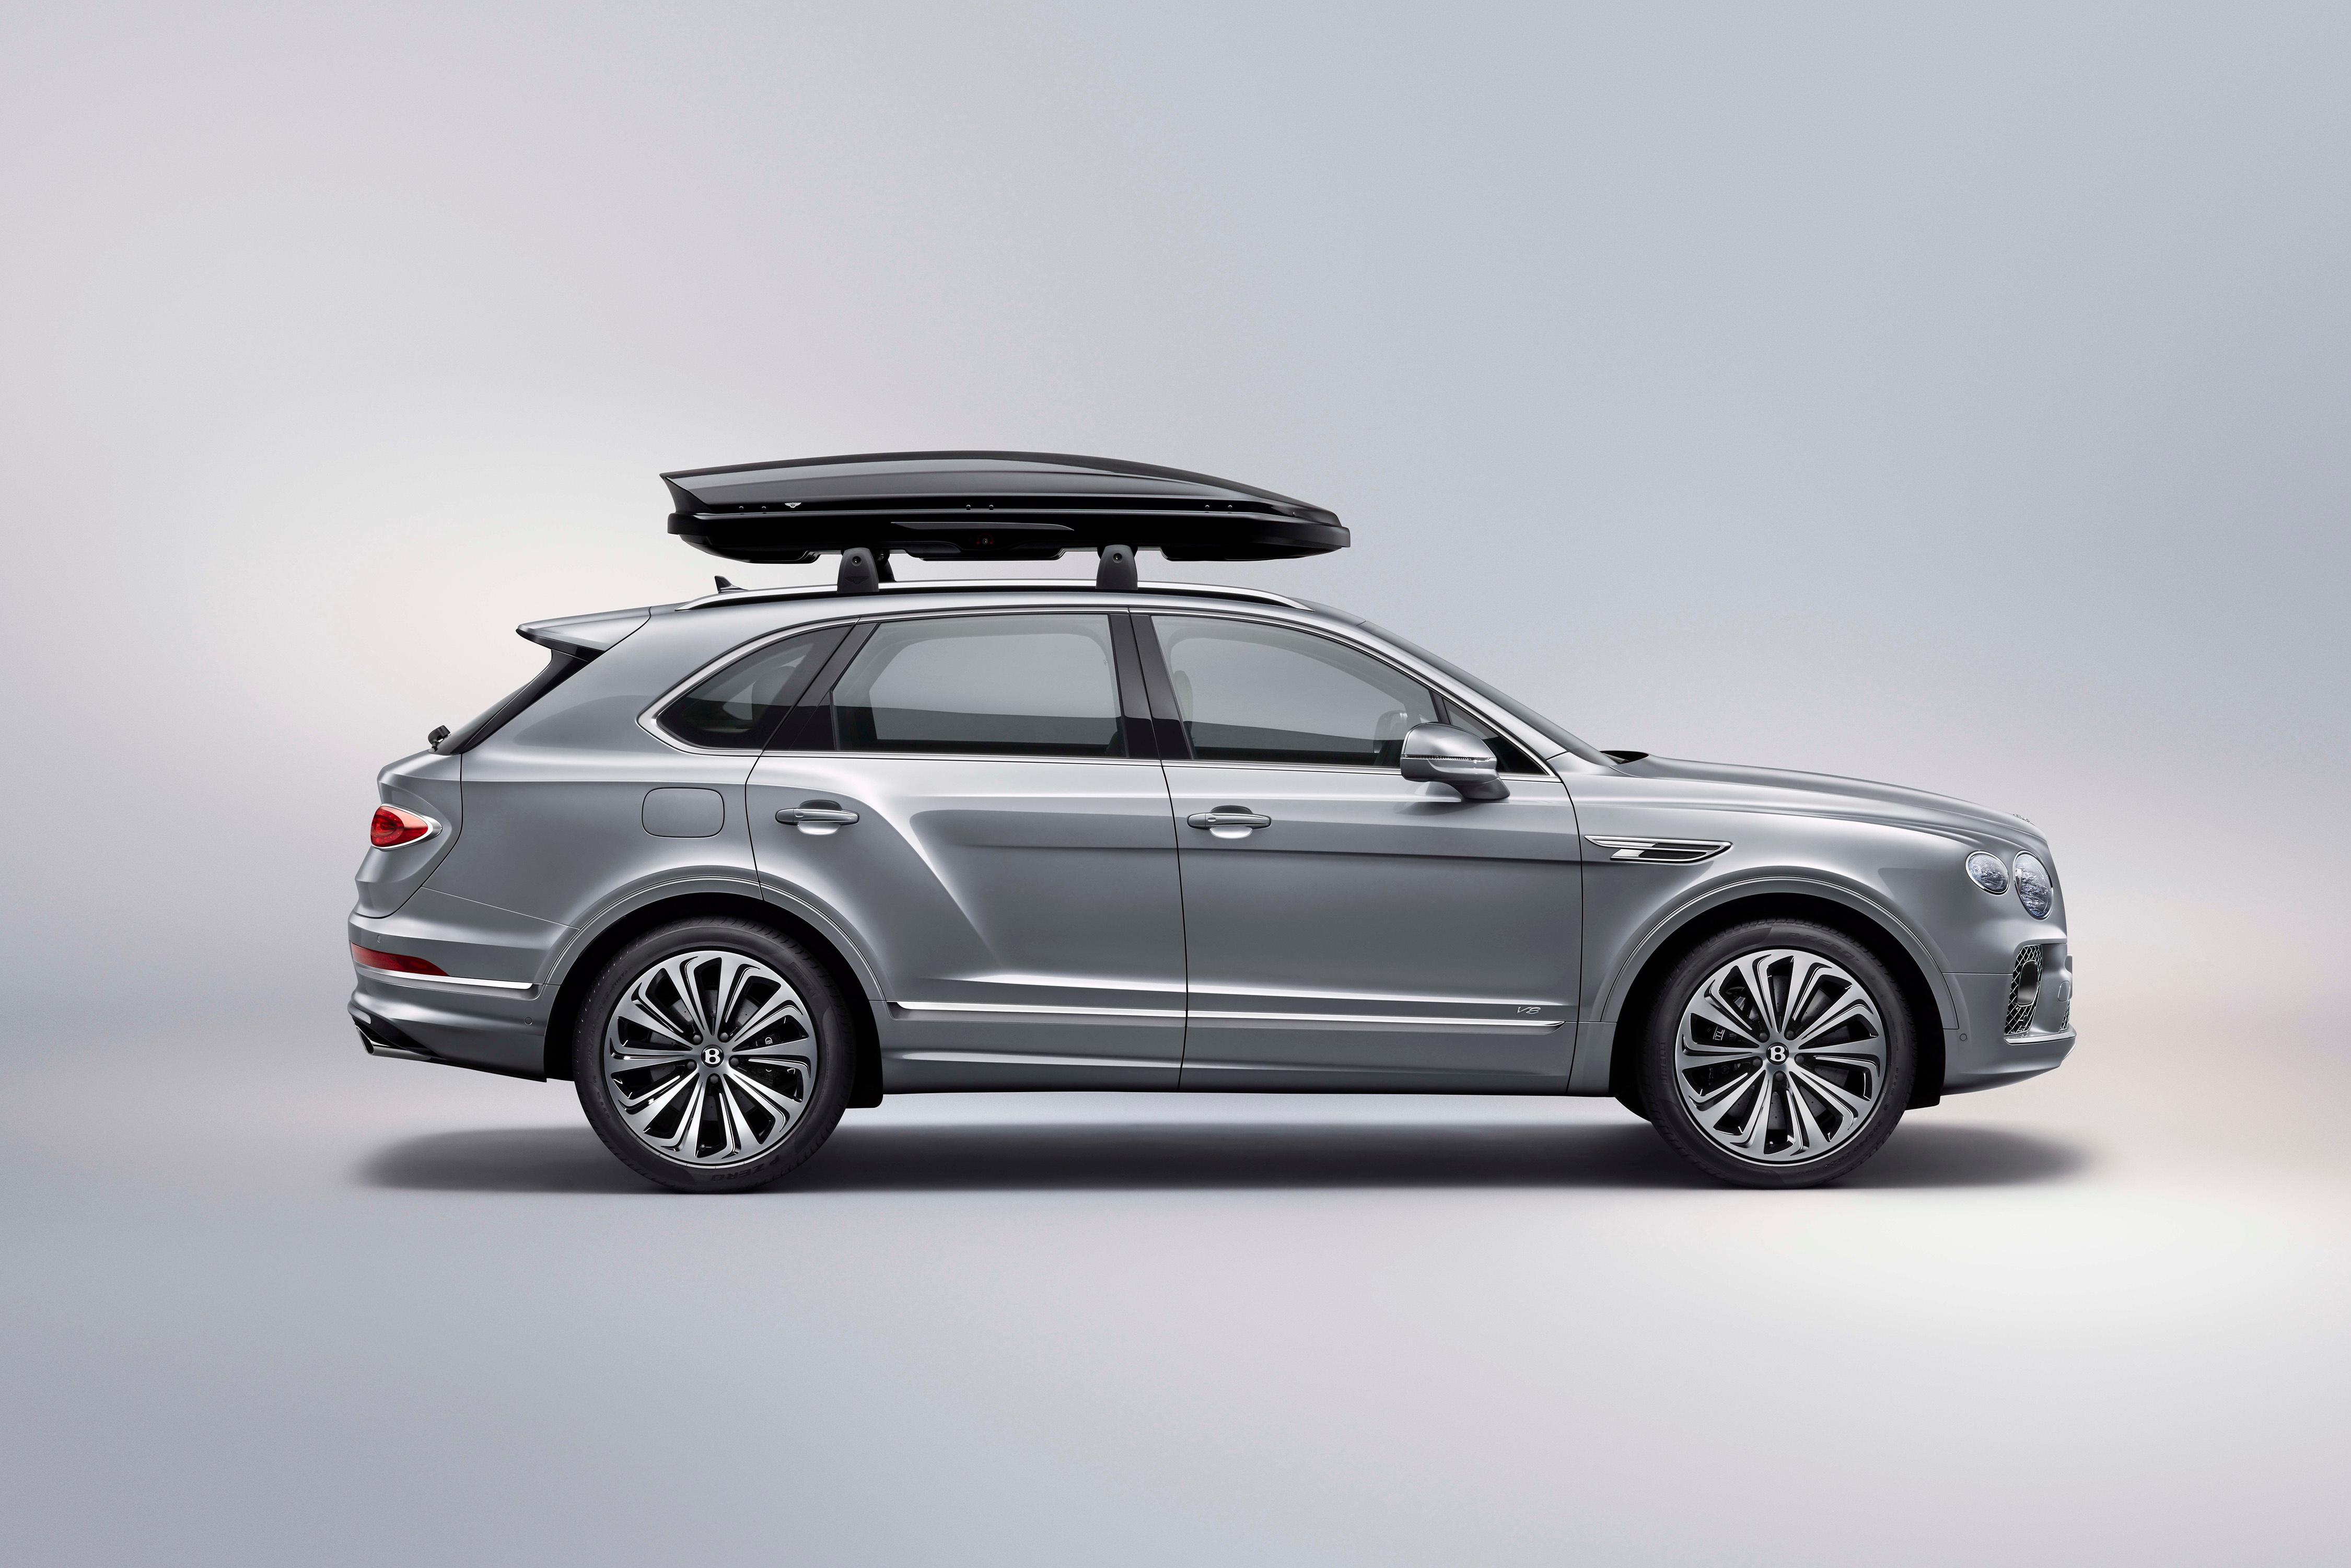 Picture Bentley Crossover Bentayga V8 Worldwide, 2020 gray Cars Side Metallic 4500x3001 CUV Grey auto automobile